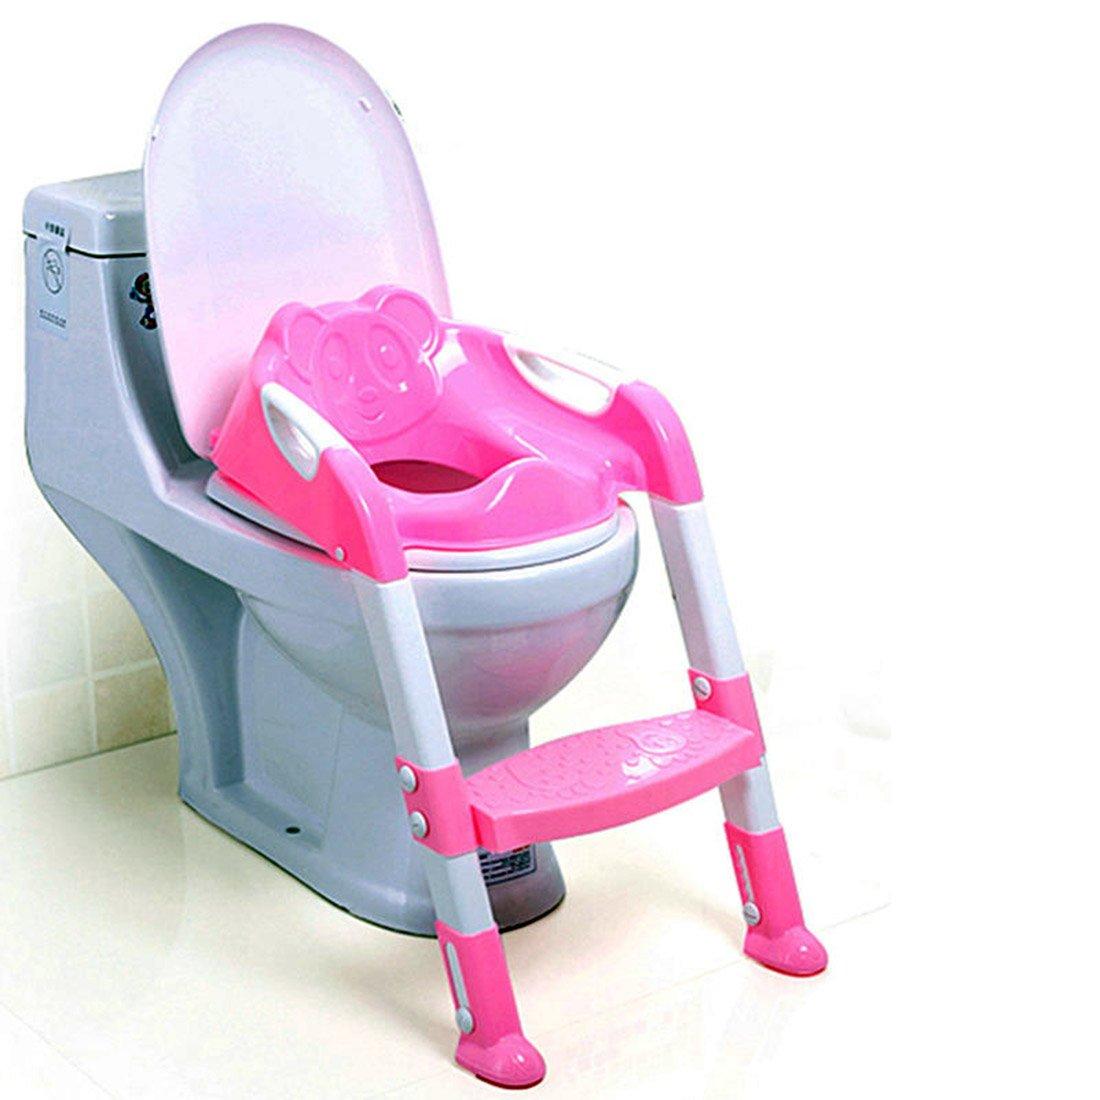 izasky Potty Training Seat Handles 2 Colors - Potty Toilet Seat Children's Potty Baby Toilet Seat with Adjustable Ladder Infant Toilet Training Folding Seat (Blue)